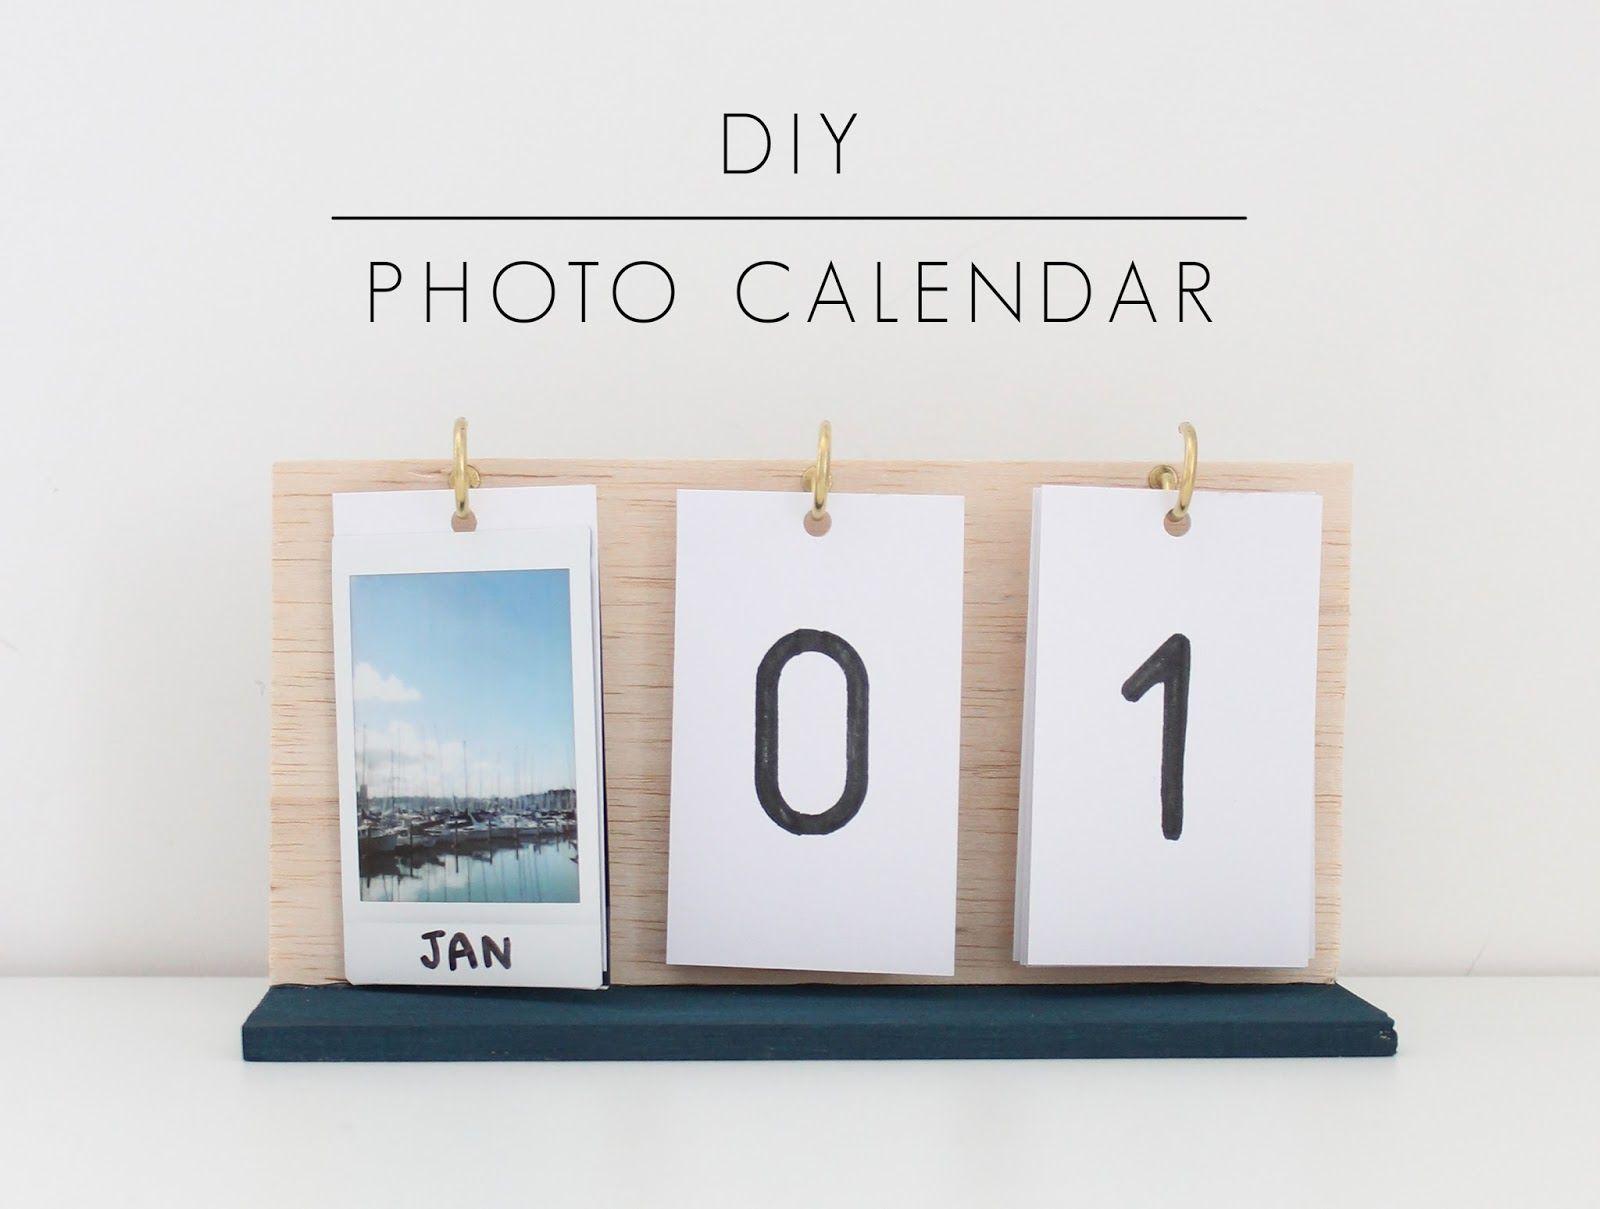 Desk Photo Calendar Diy Calendar Diy Gifts For Friends Diy Gifts